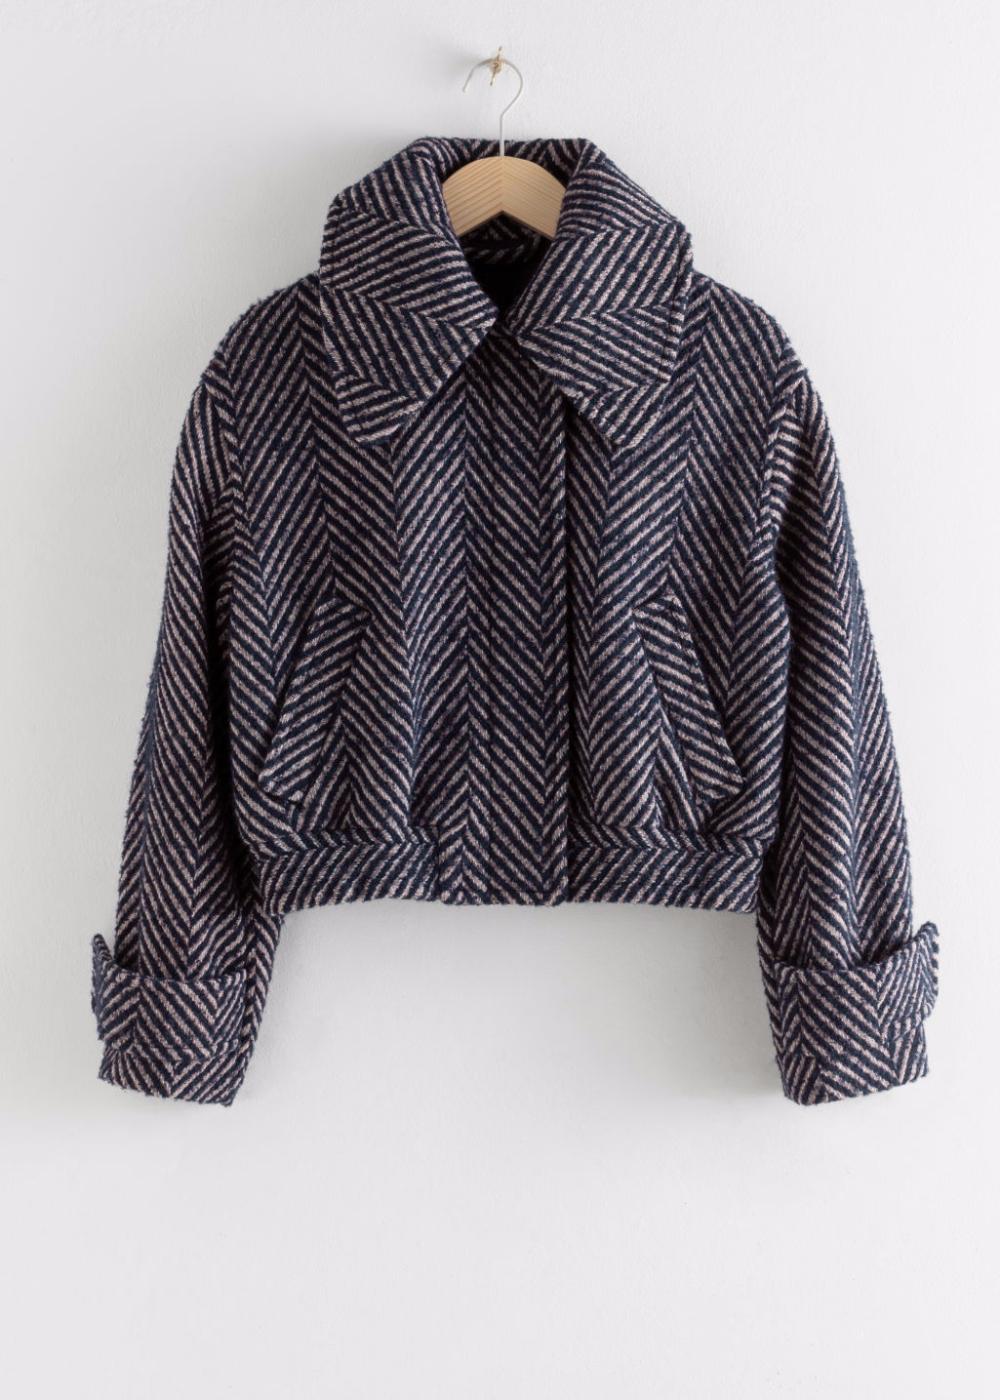 Pdp Herringbone Jacket Herringbone Coat Herringbone Coat Outfit [ 1400 x 1000 Pixel ]